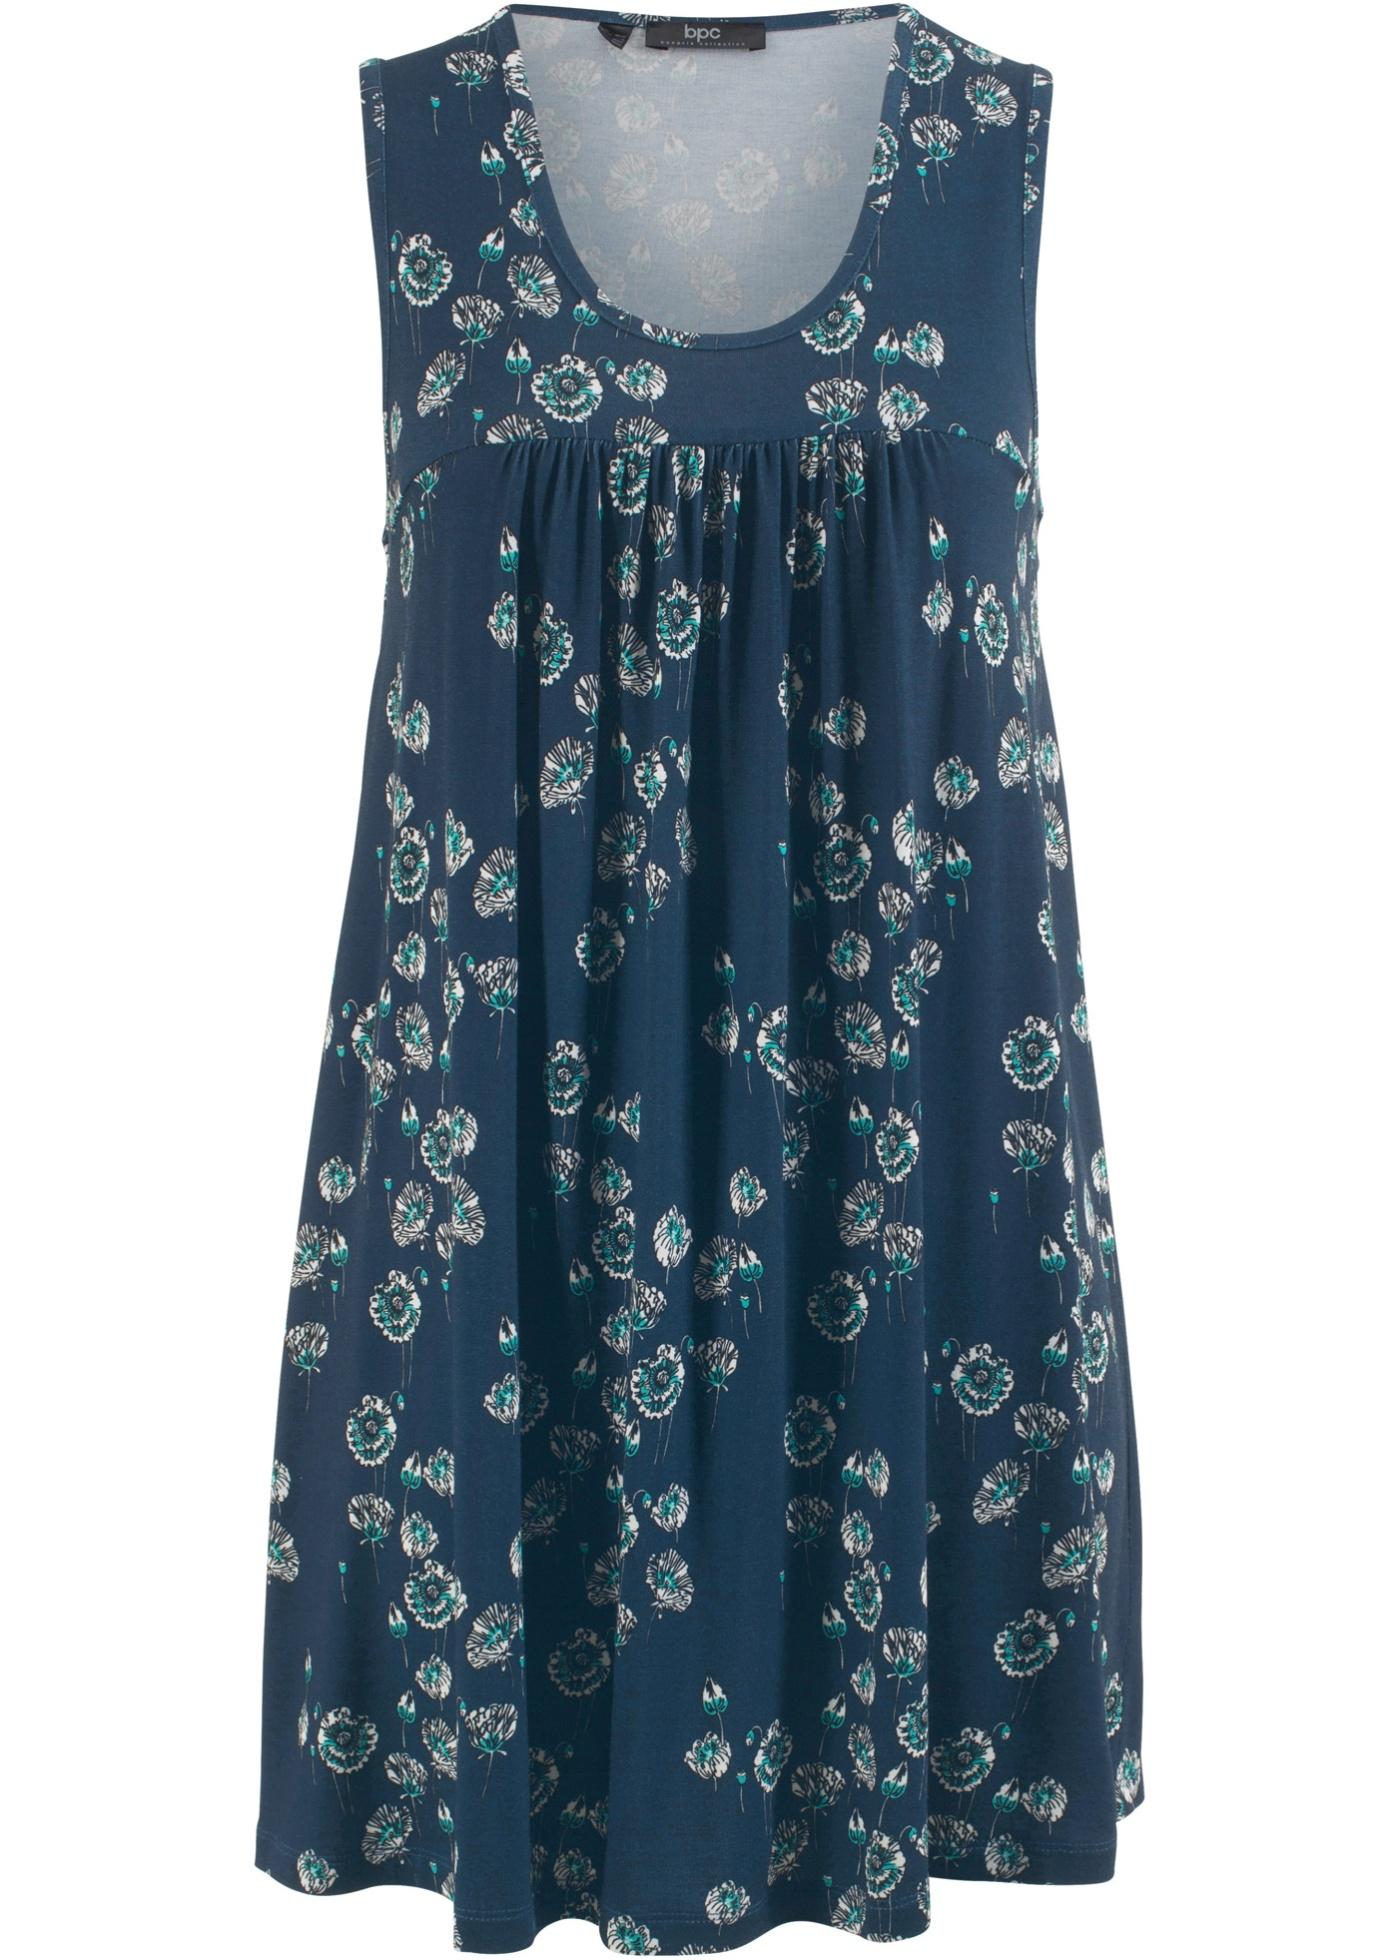 Šaty bez rukávů - Modrá